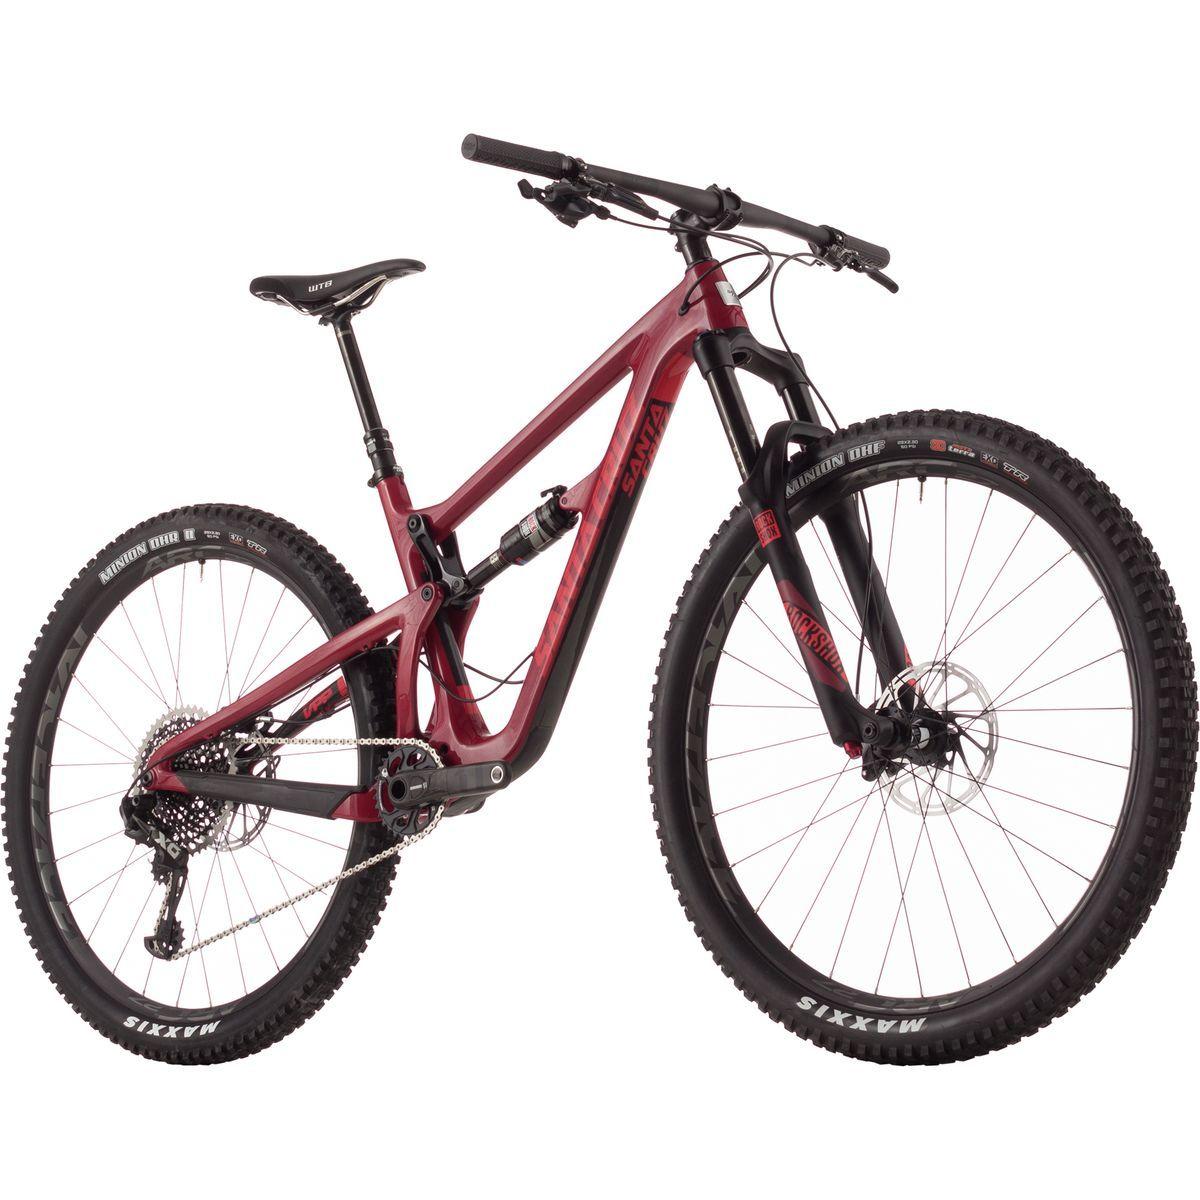 Santa Cruz Bicycles Hightower Carbon Cc 29 X01 Eagle Complete